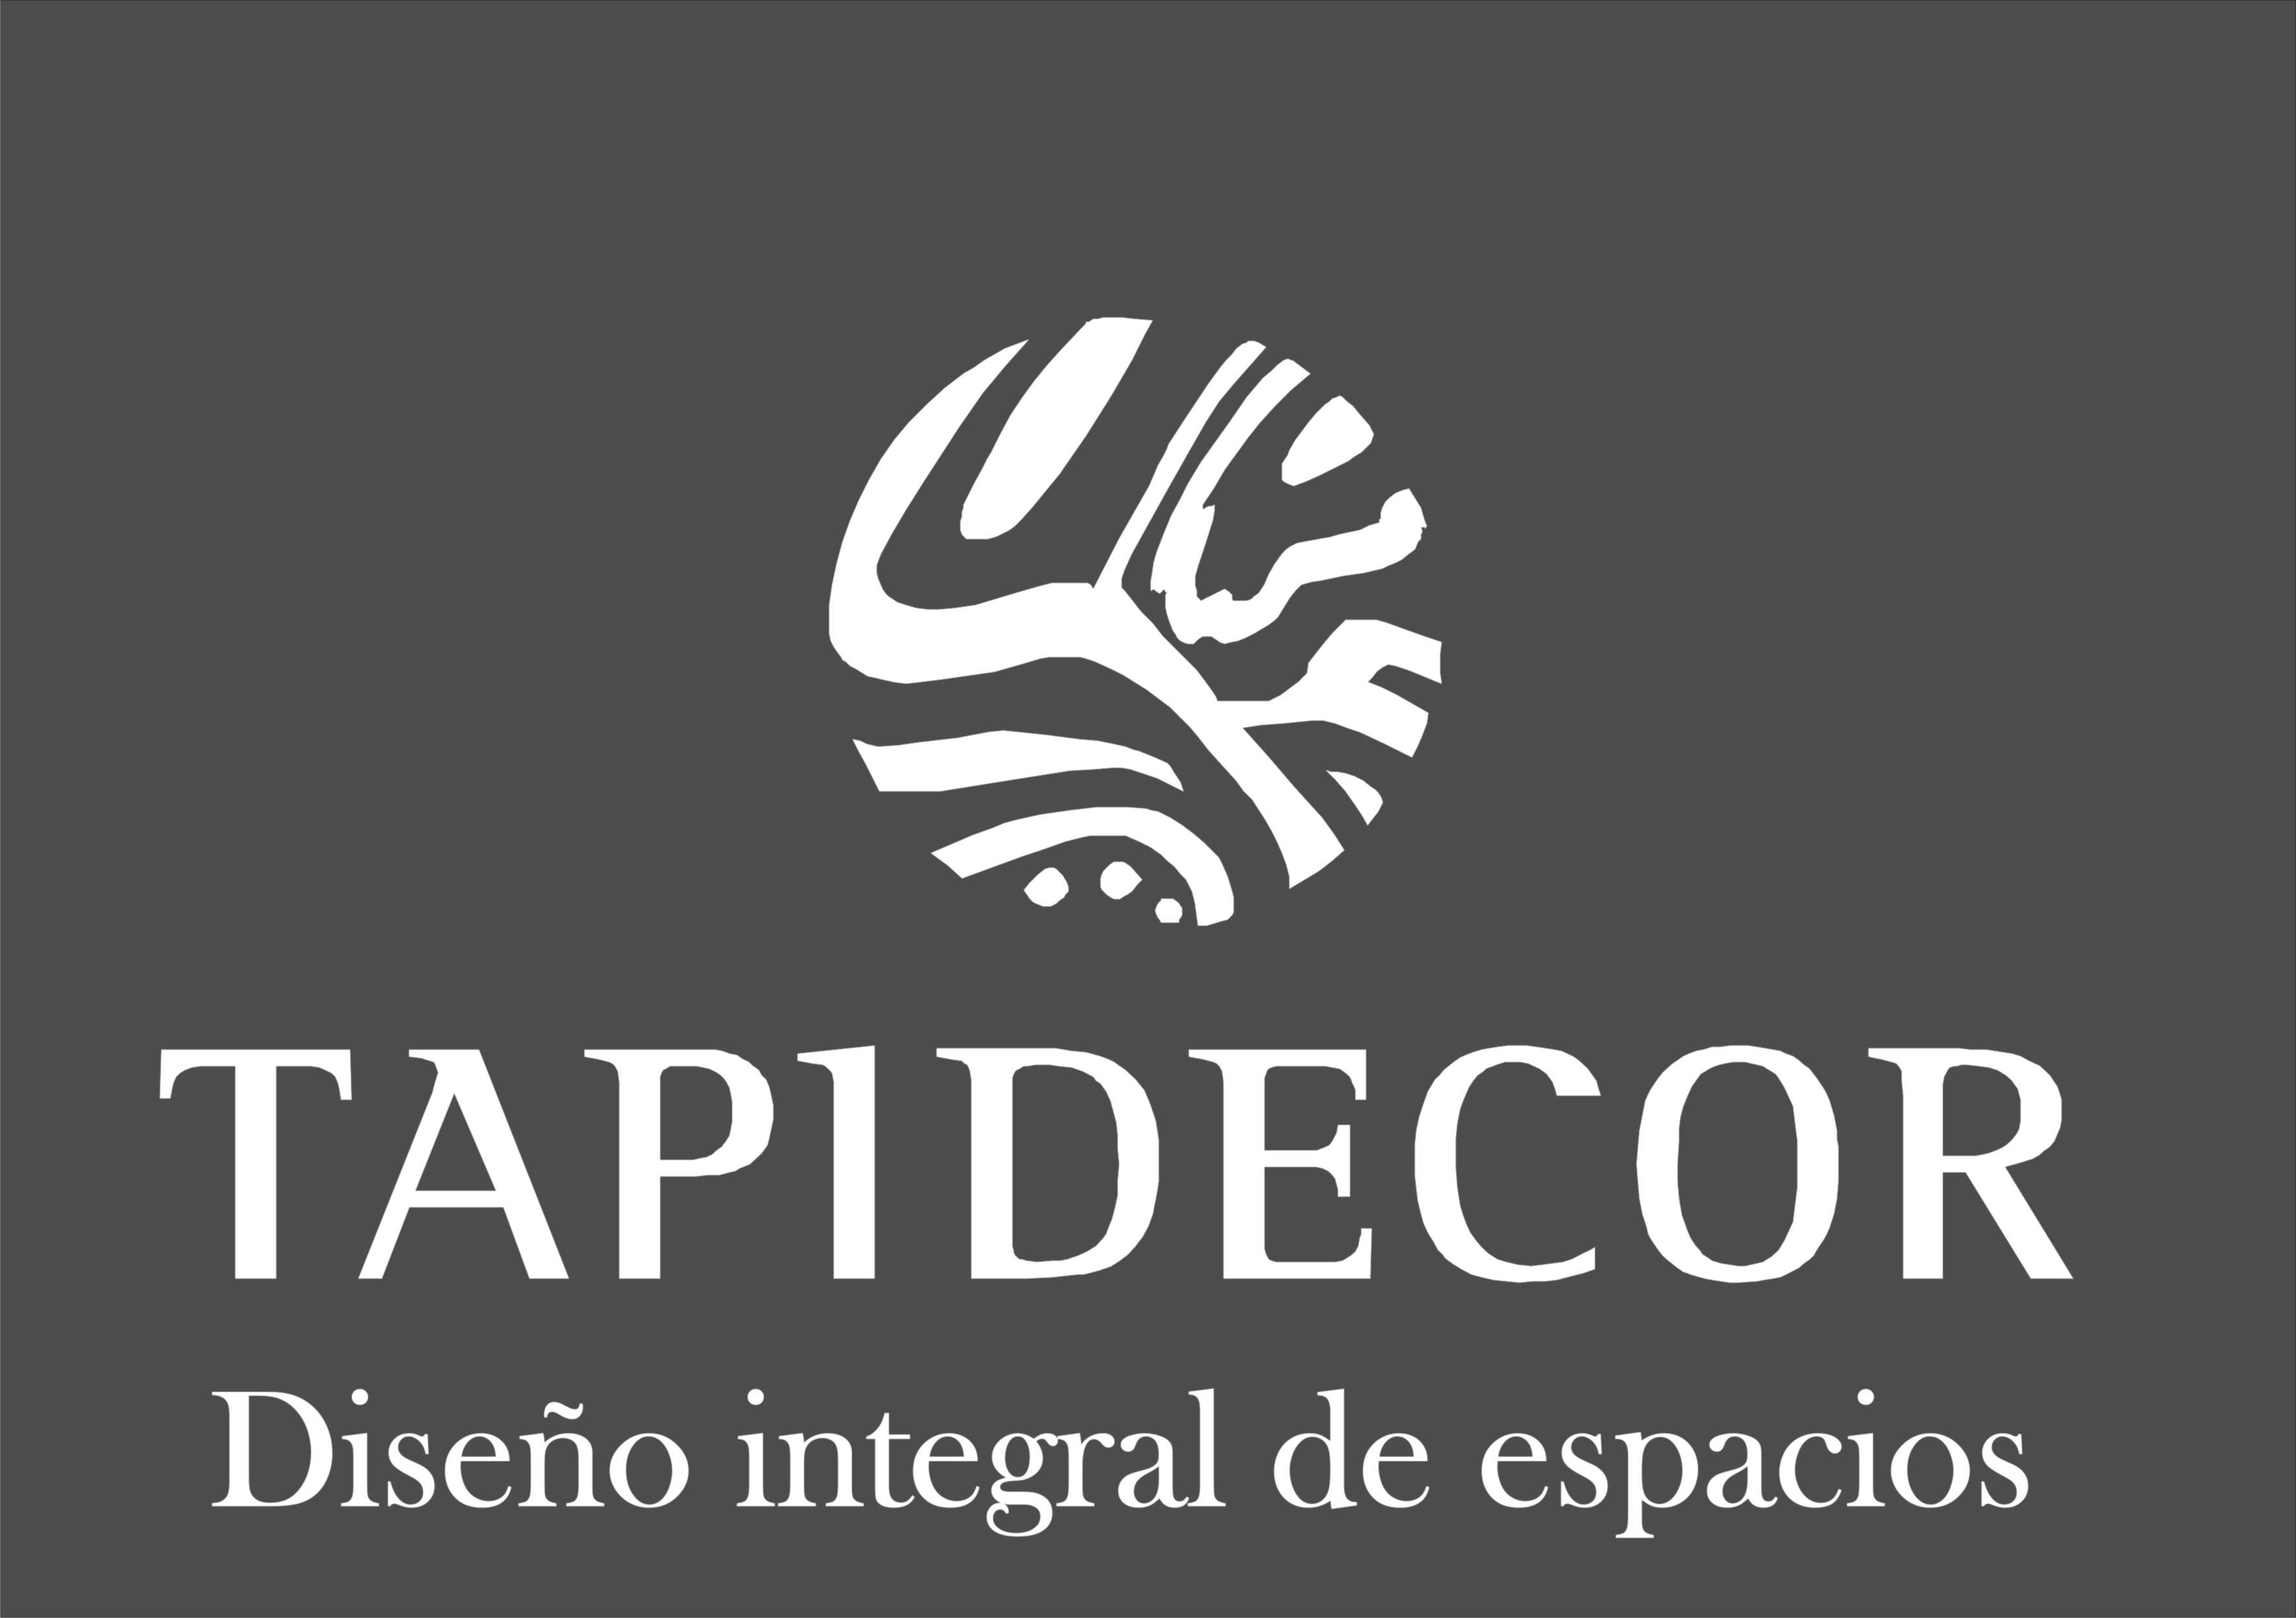 Tapidecor